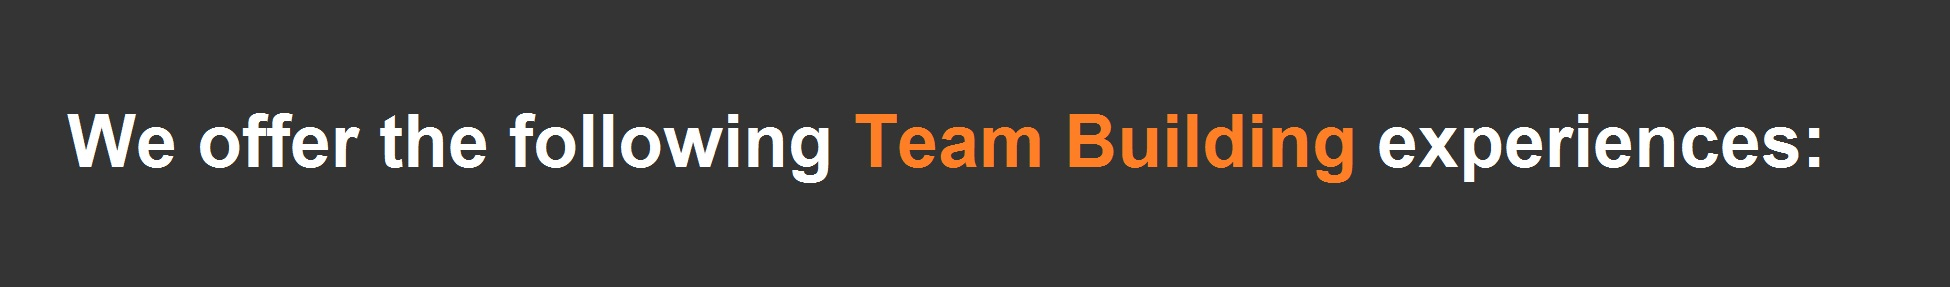 Team buildig experiences